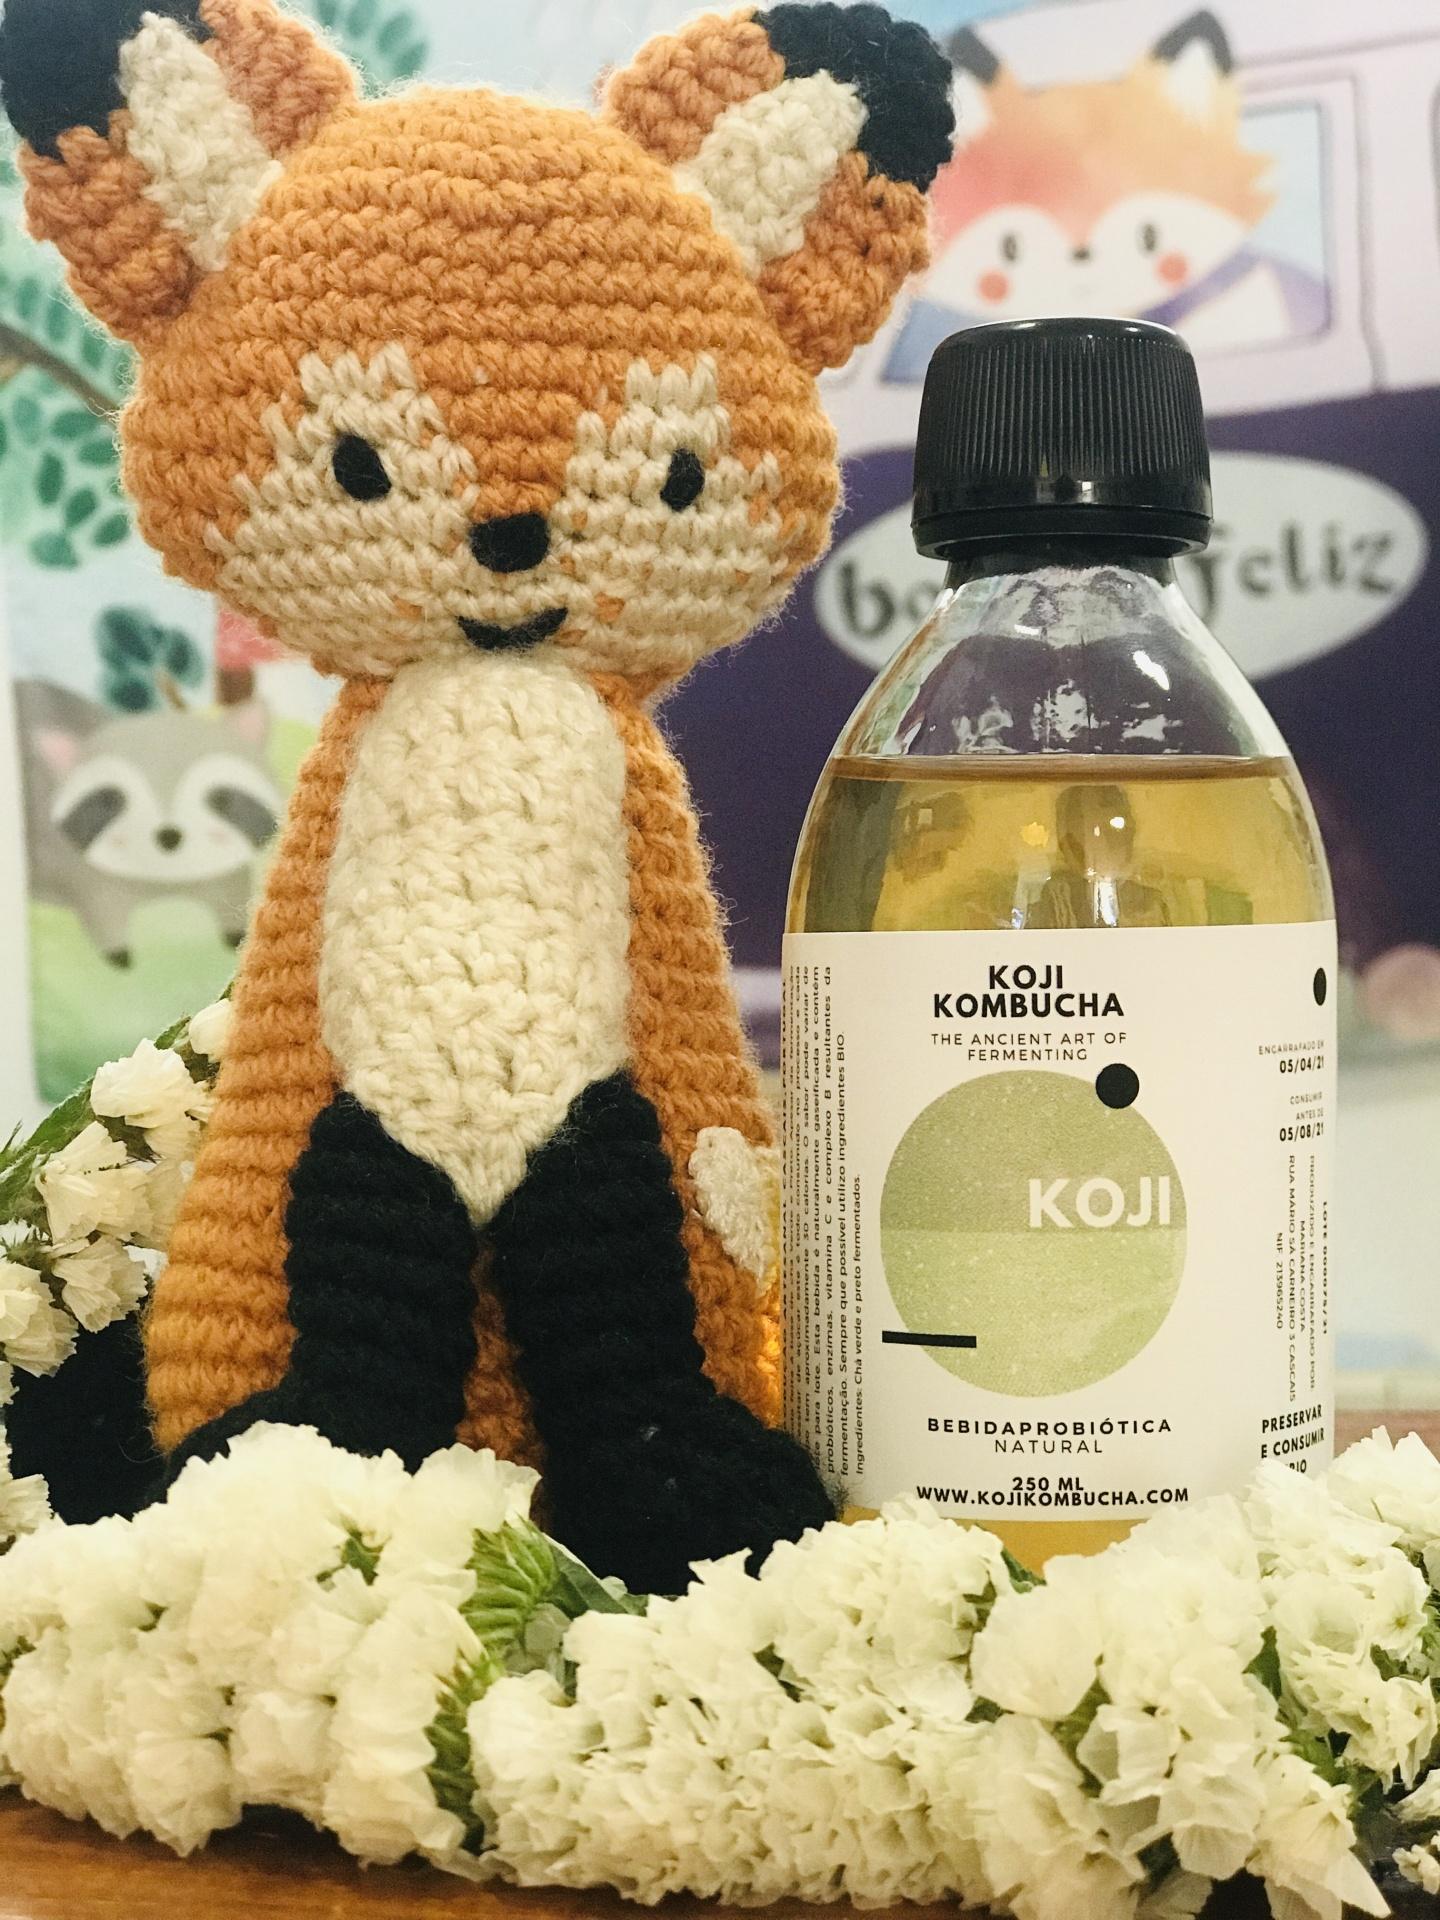 Koji Kombucha | Koji